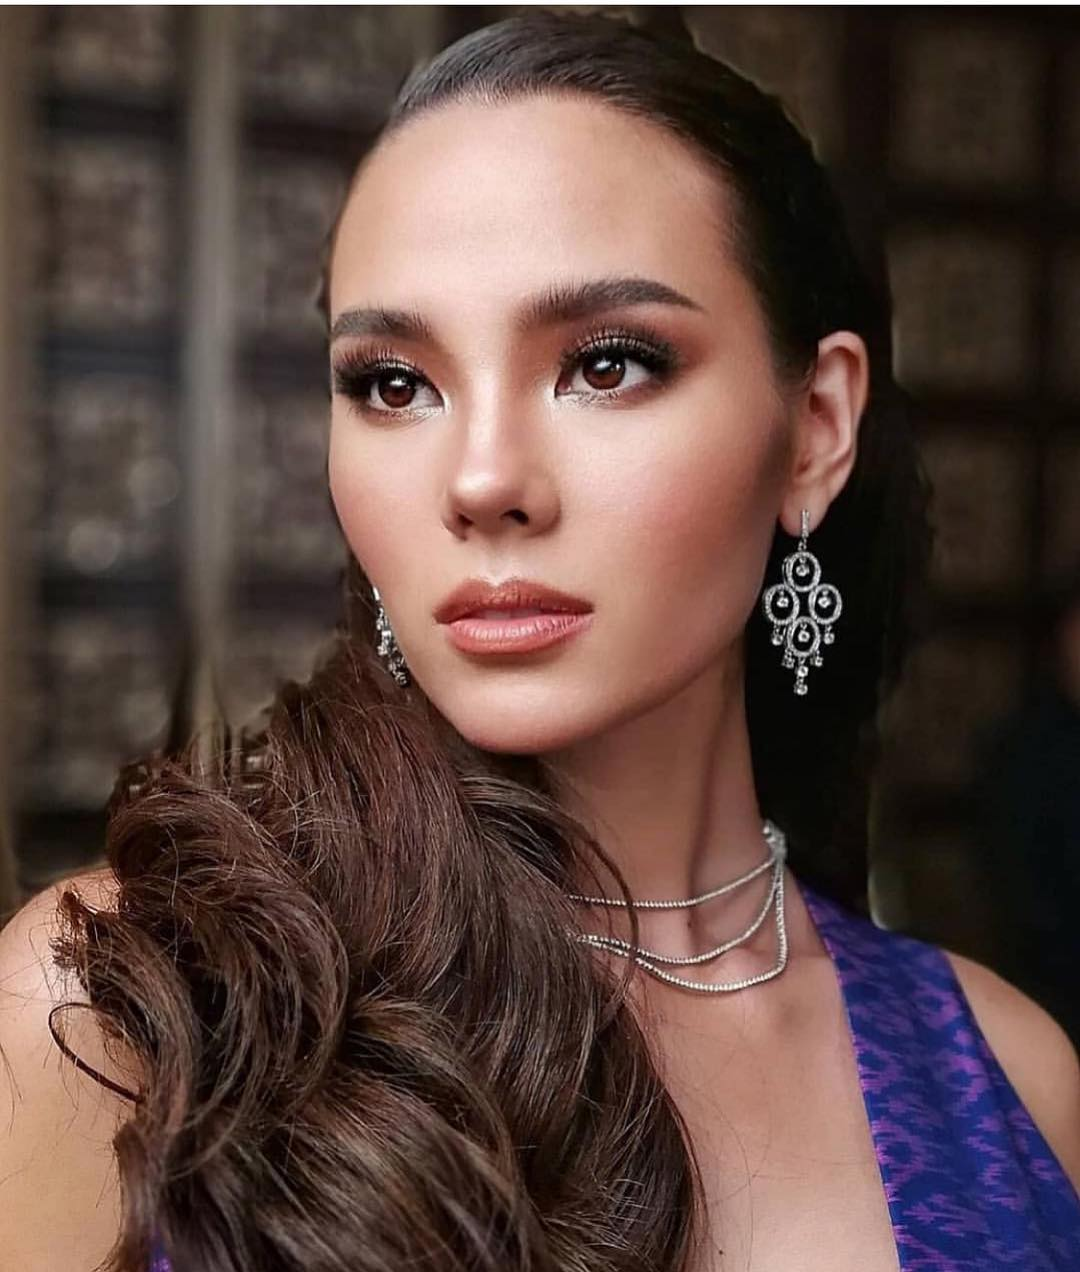 thai night gala dinner de candidatas a miss universe 2018. - Página 8 T964weh7